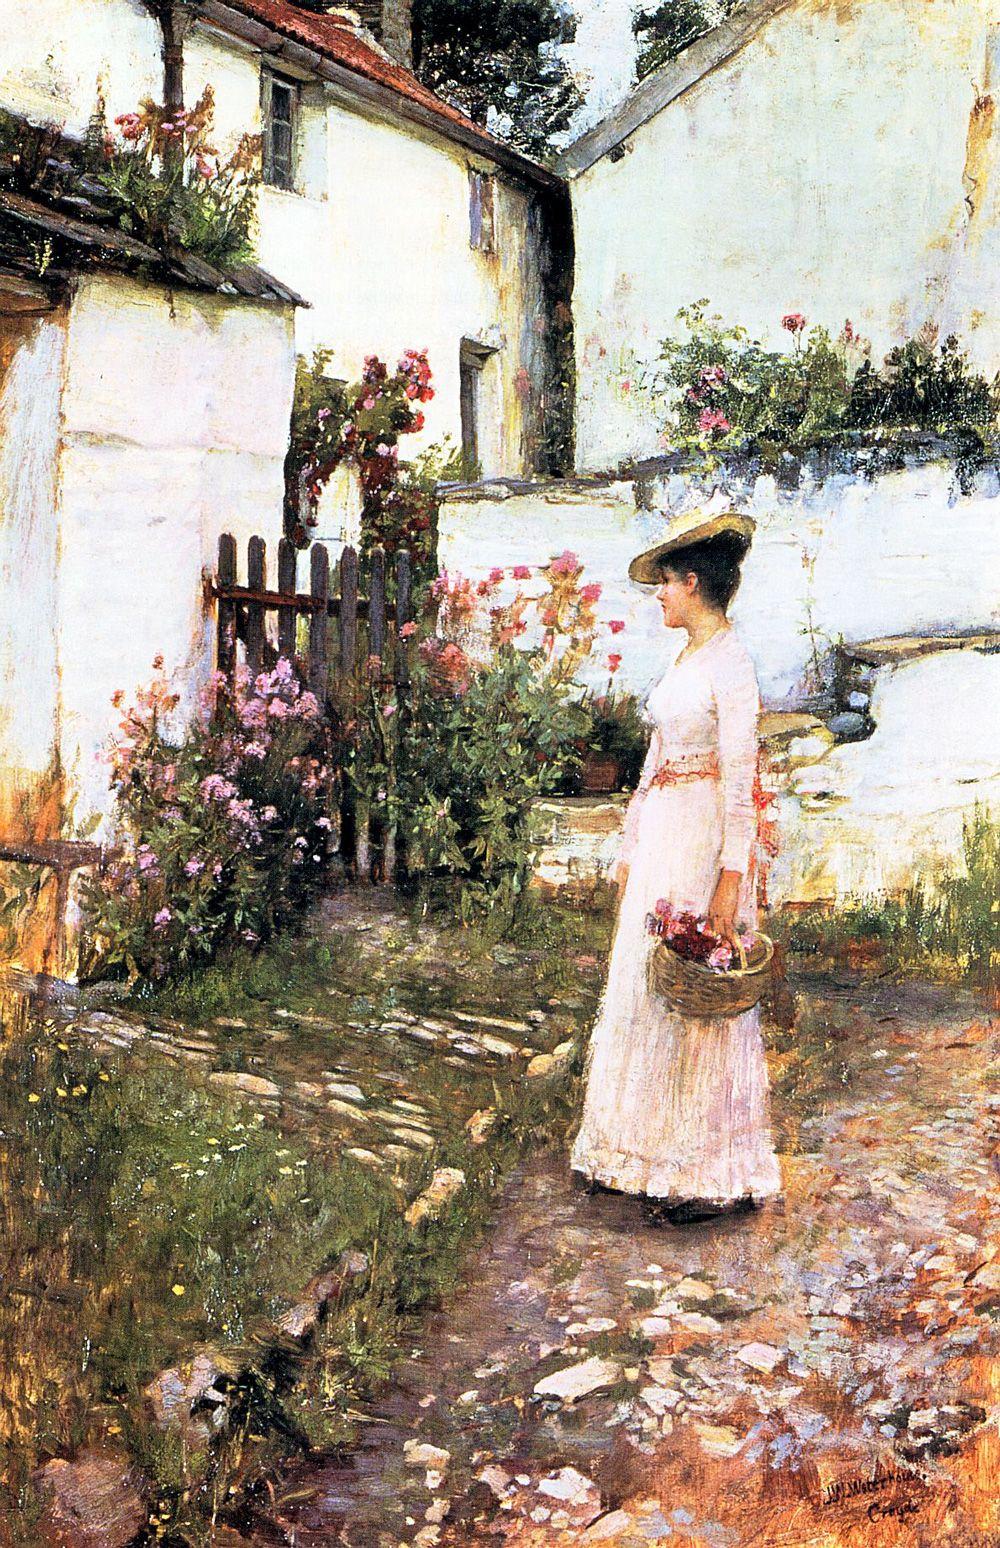 Gathering Summer Flowers in a Devonshire Garden by John William Waterhouse